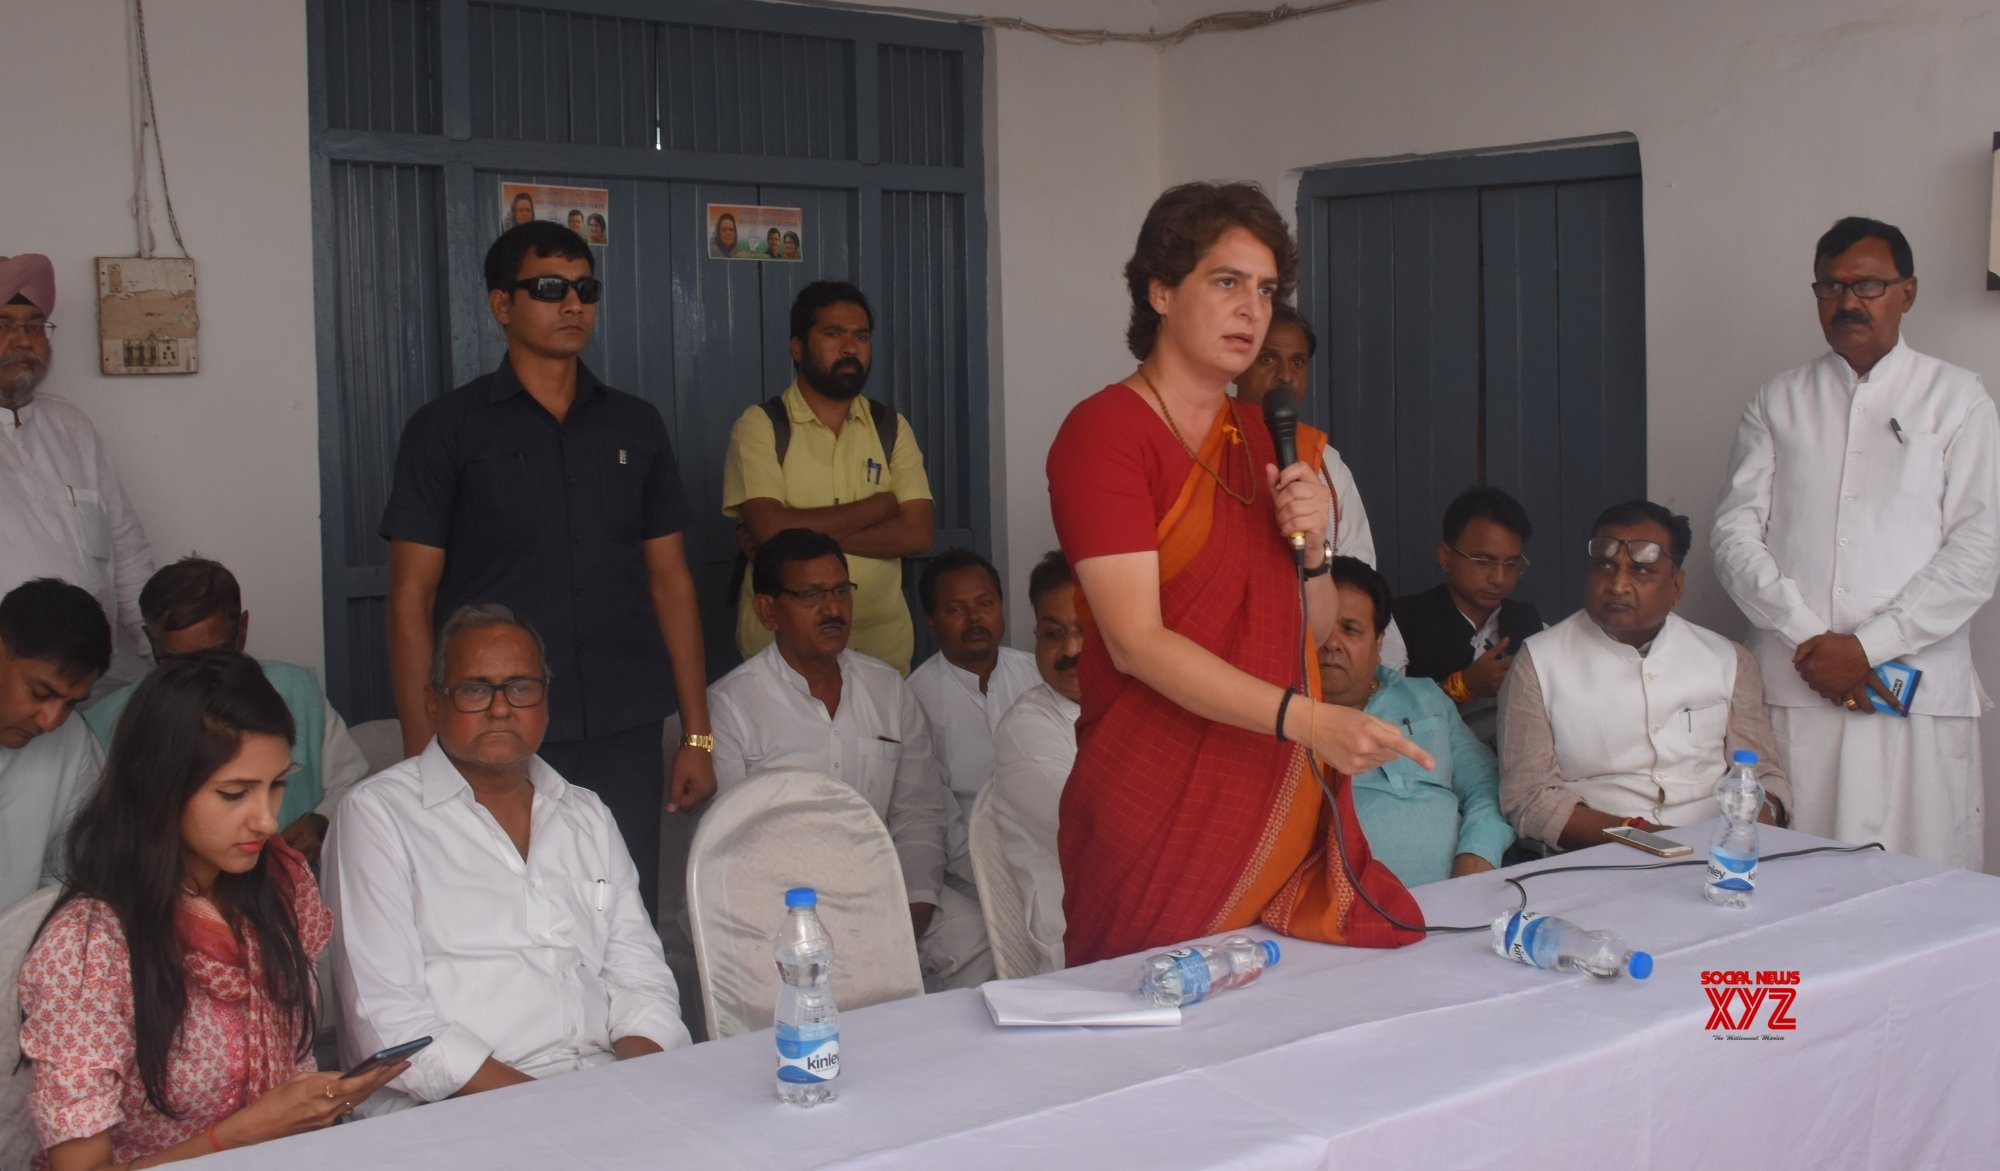 Rae Bareli (UP): Priyanka Gandhi Vadra at Congress meeting #Gallery